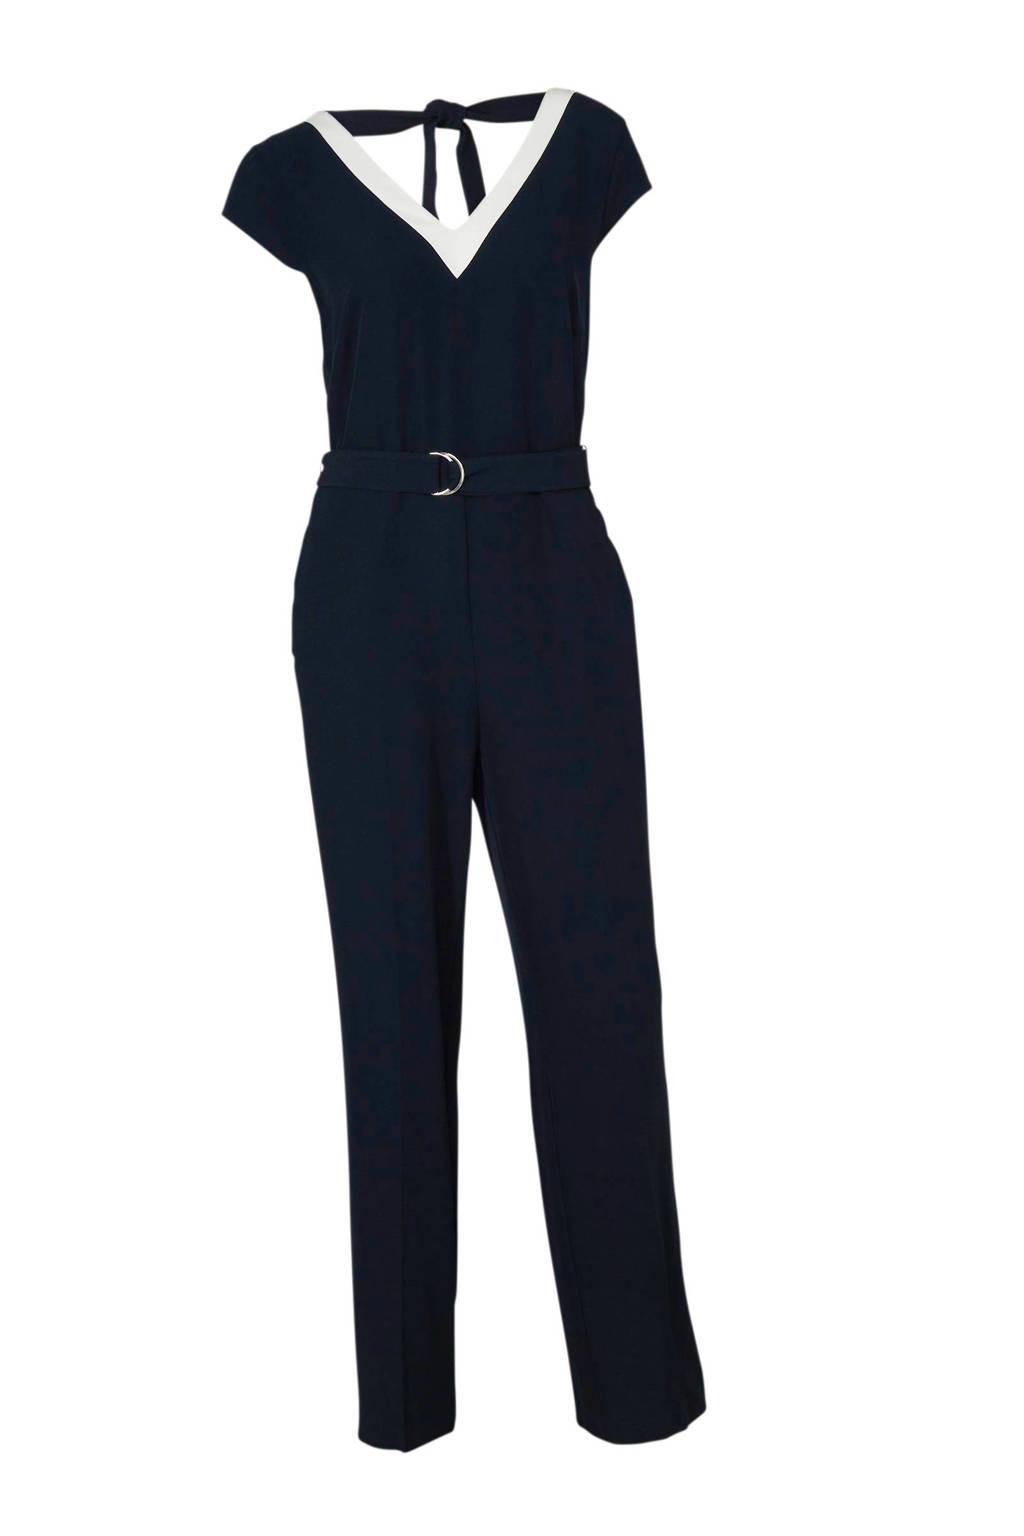 C&A Yessica jumpsuit met zijstreep marine/wit, Marine/wit